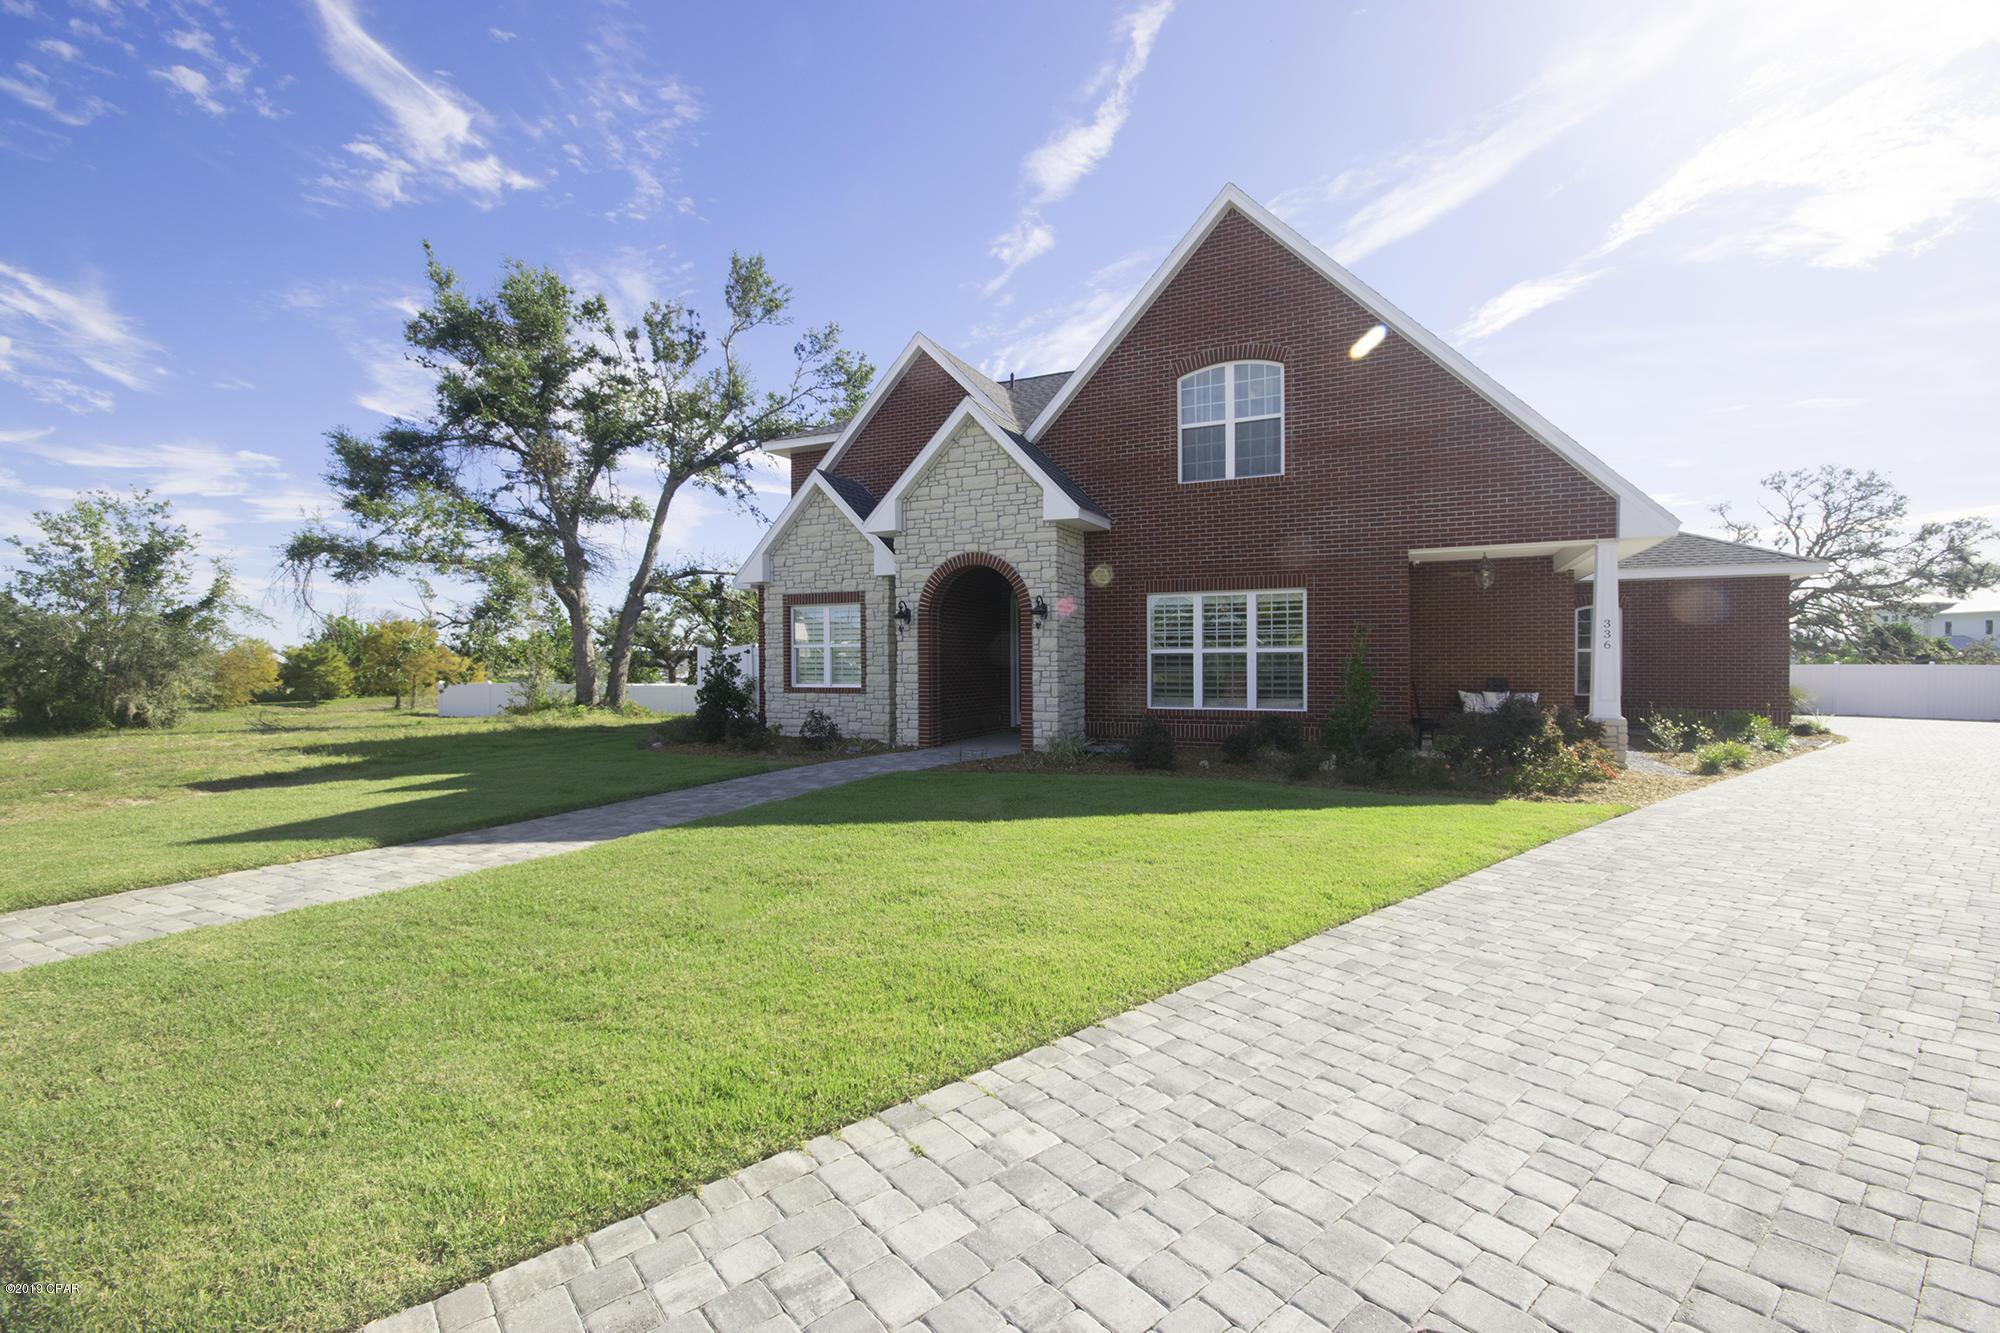 Property ID 690083